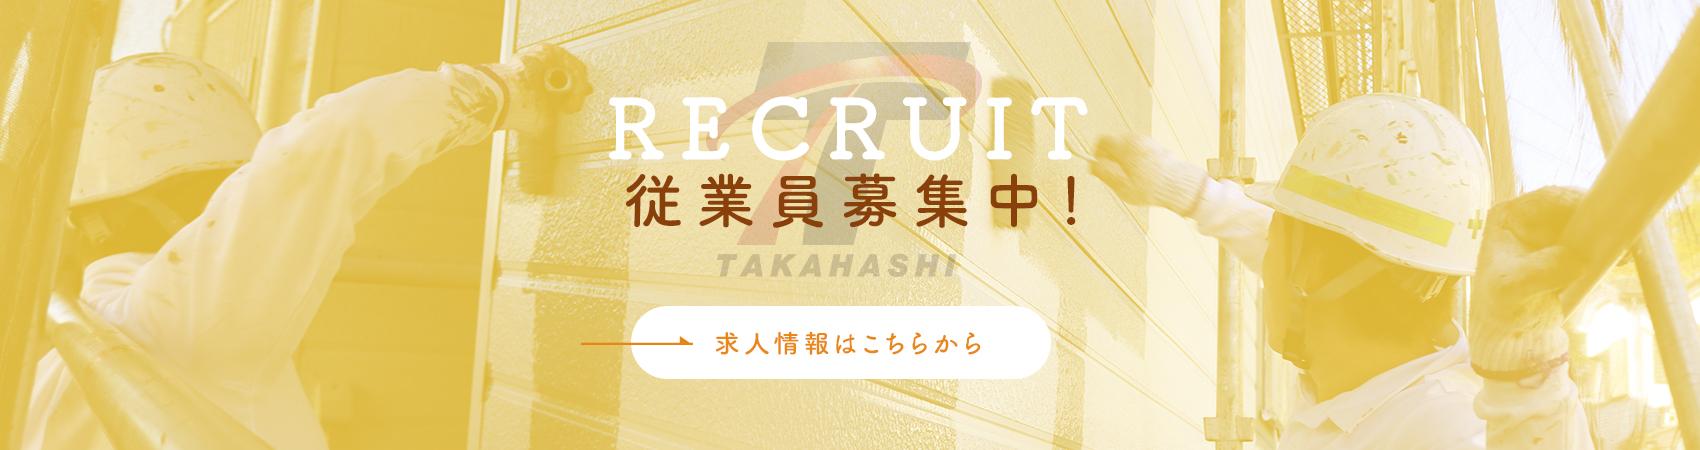 recruit_banner